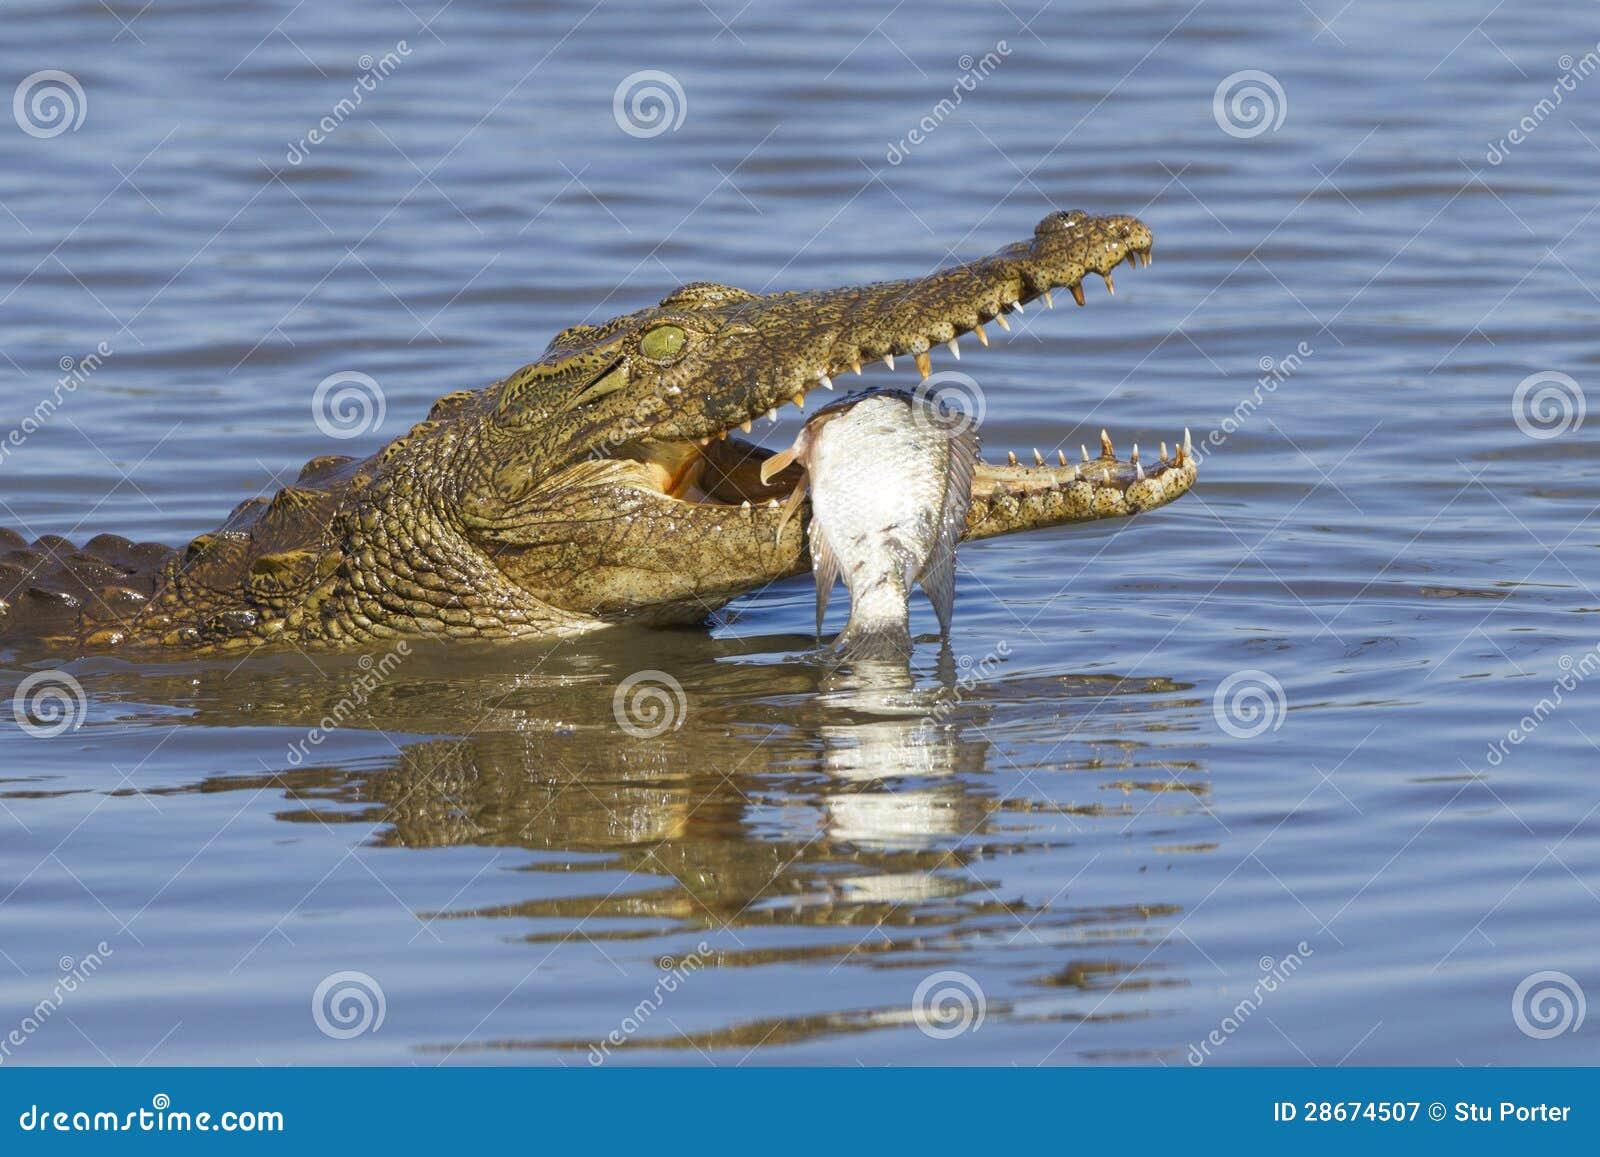 1fd43ef0d09d Nile Crocodile (Crocodylus Niloticus) Eating